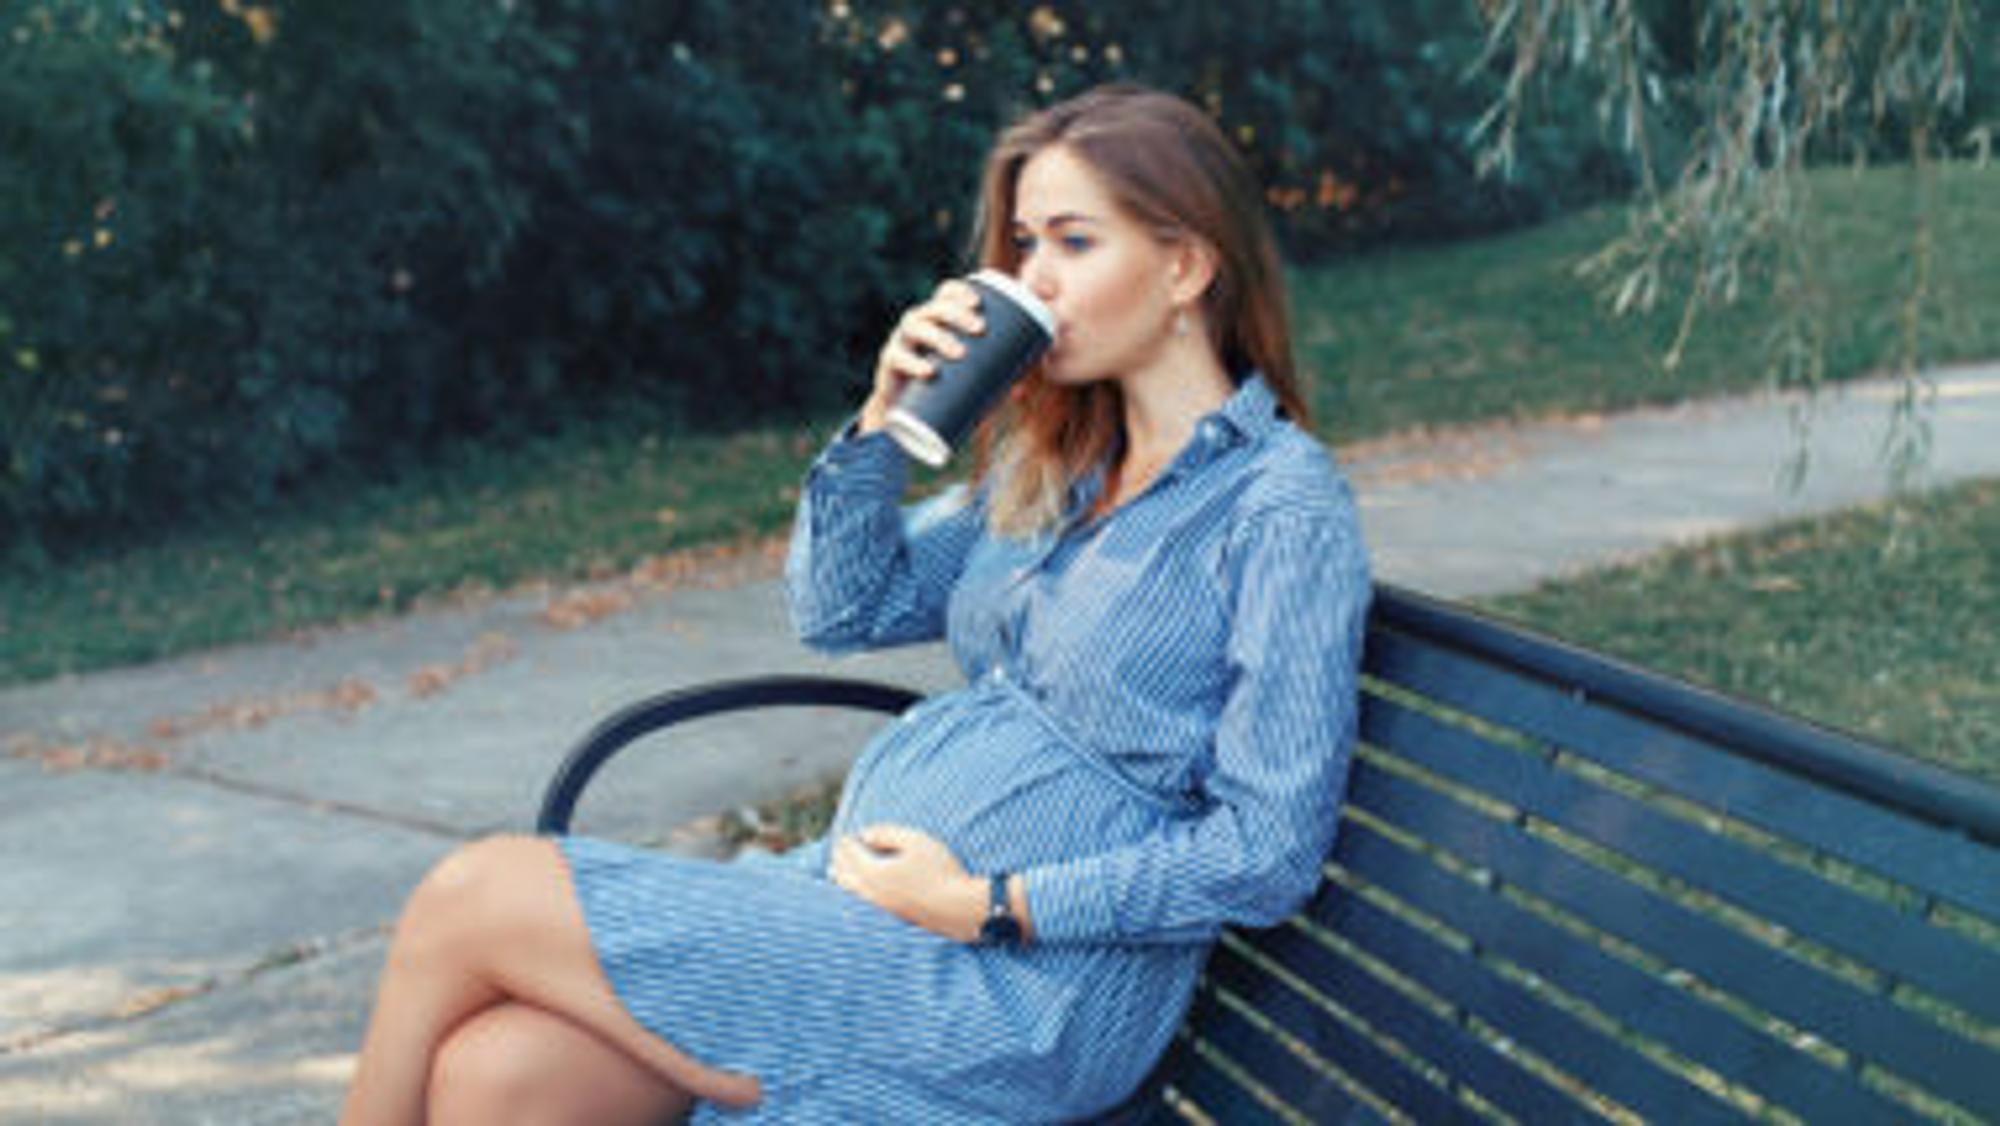 Schwangere, die Kaffee trinkt